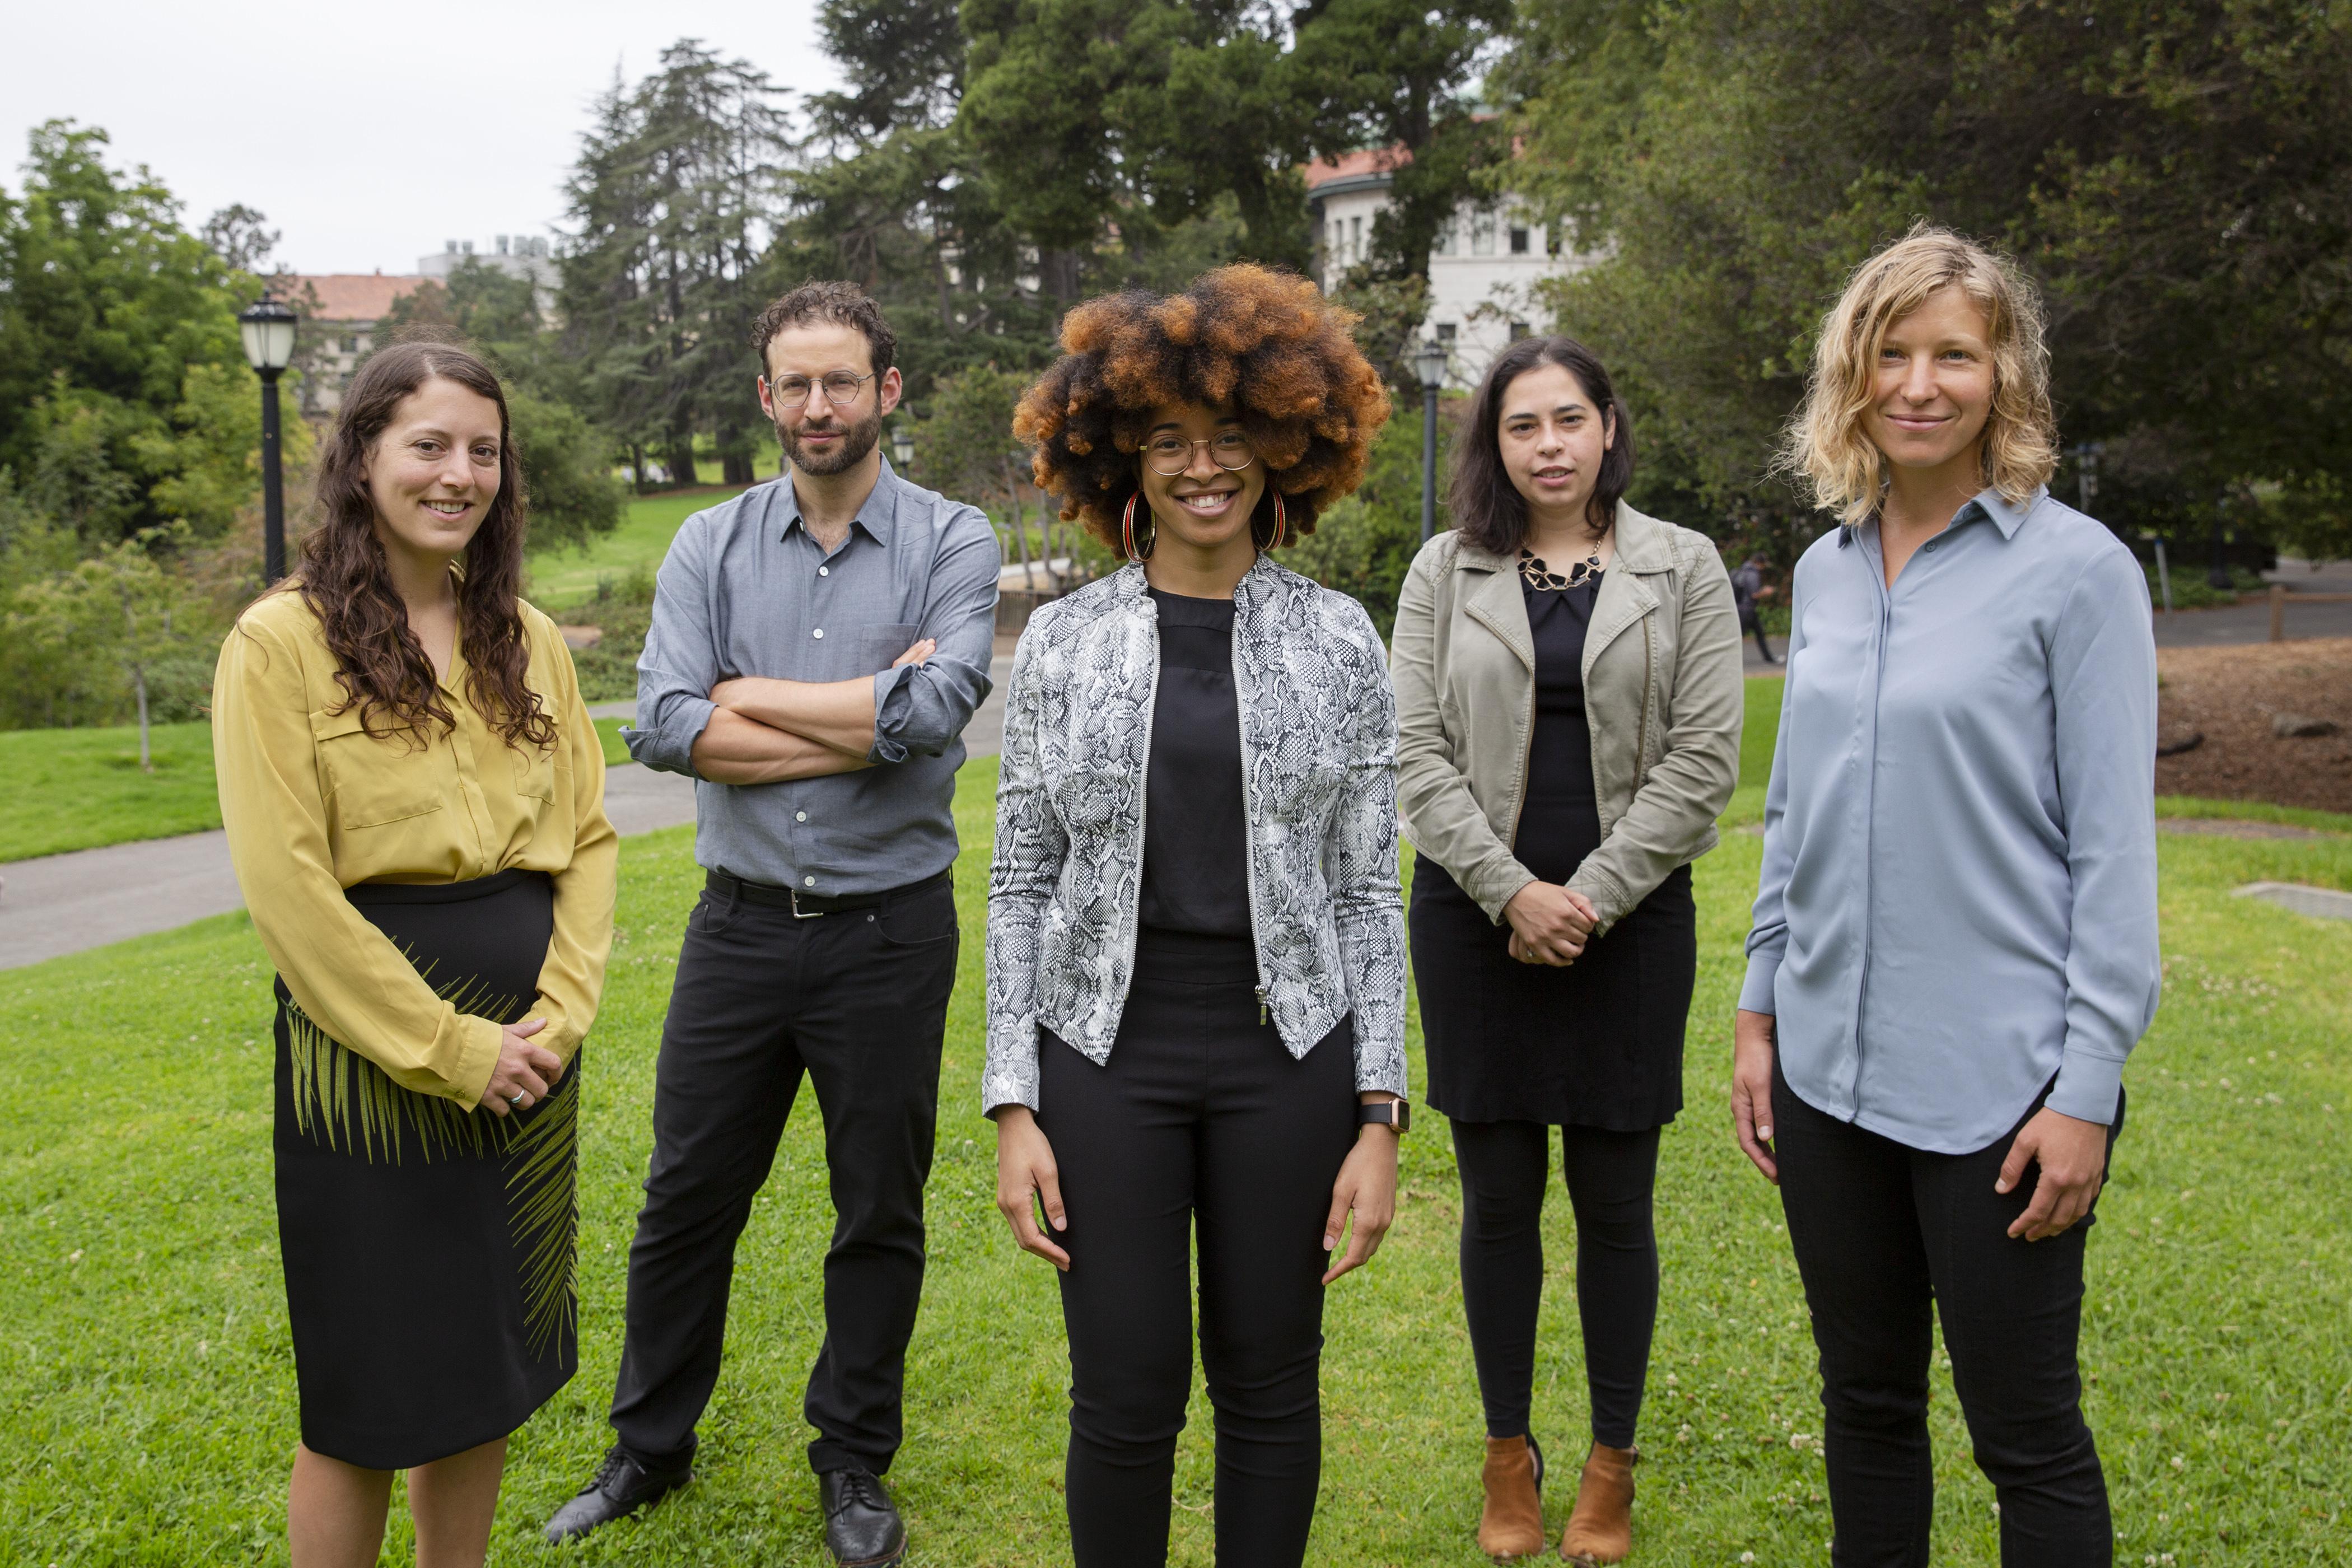 Meg Mills-Novoa, Daniel Aldana Cohen, Maya Carrasquillo, Danielle Zoe Rivera, and Zoé Hamstead.